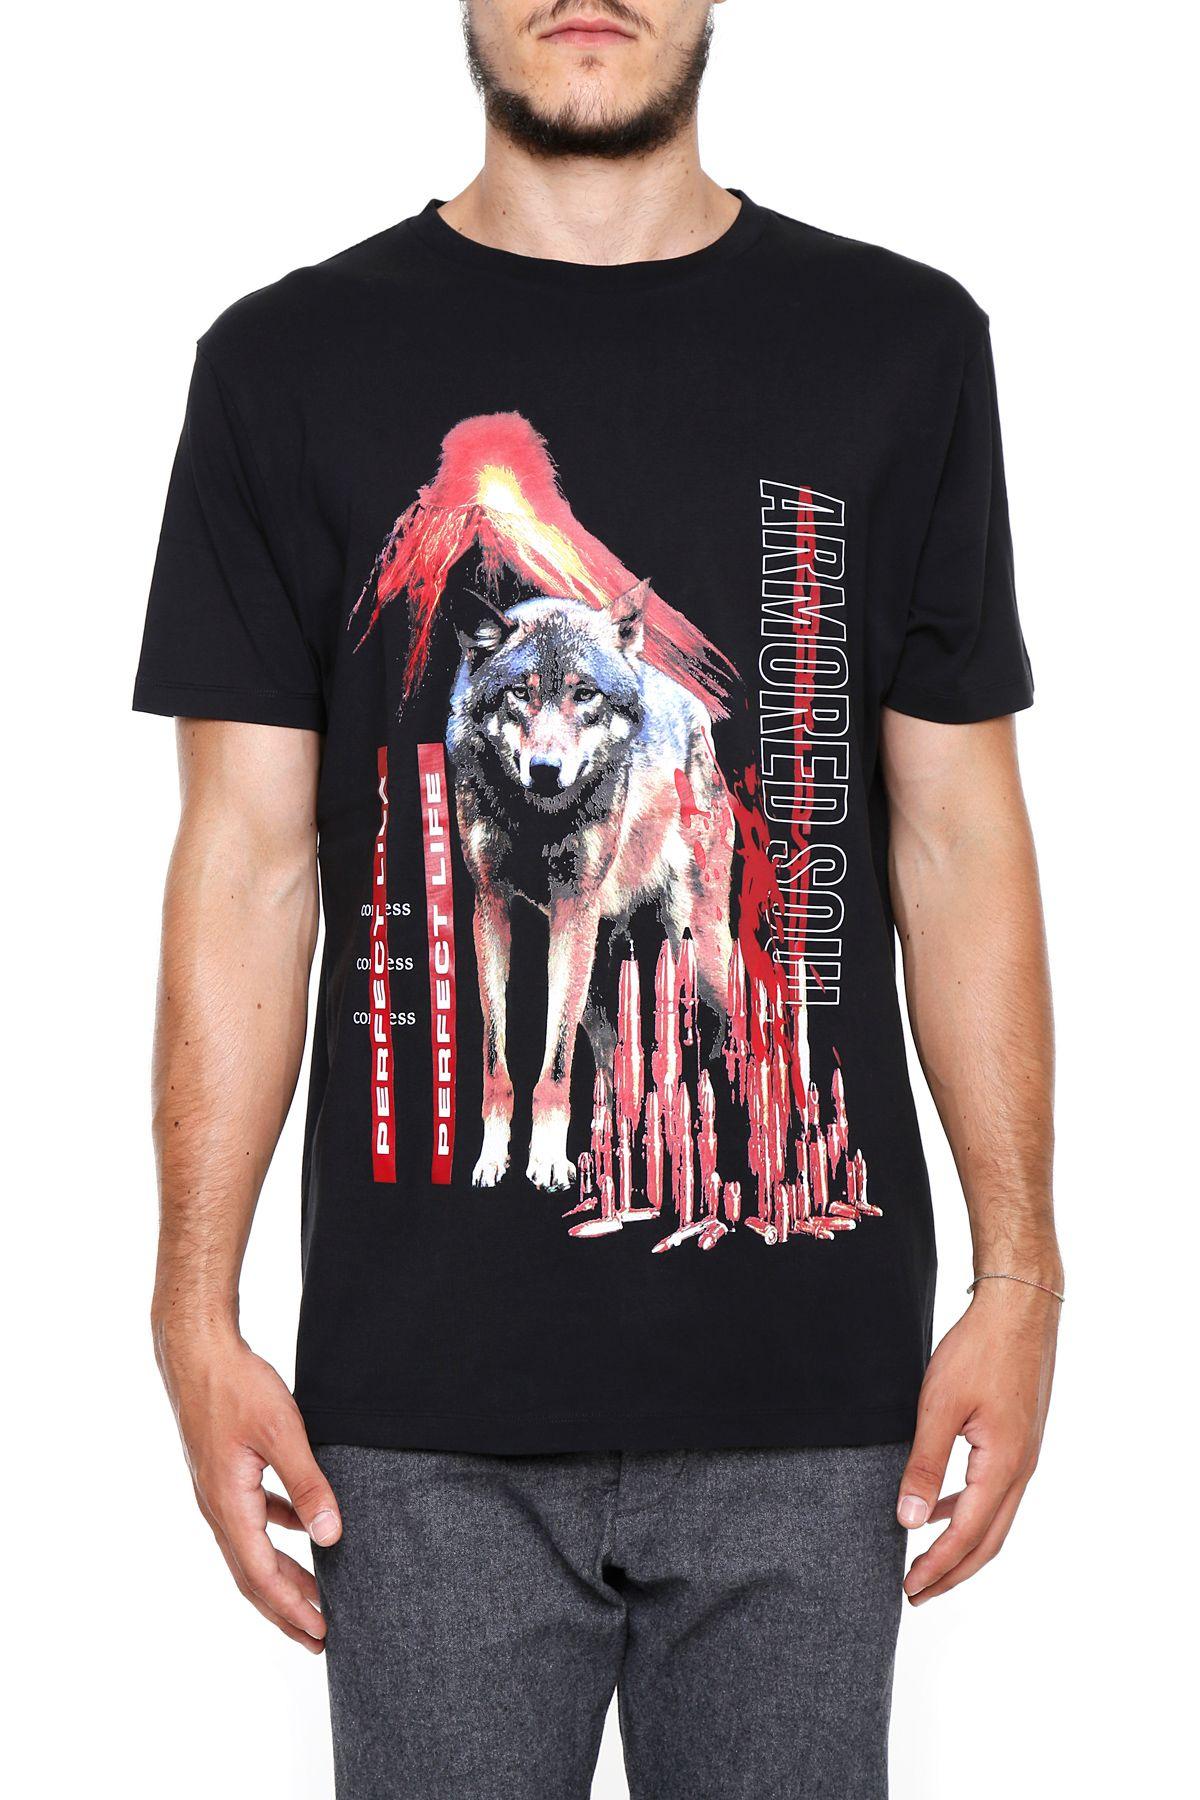 Konken T-shirt